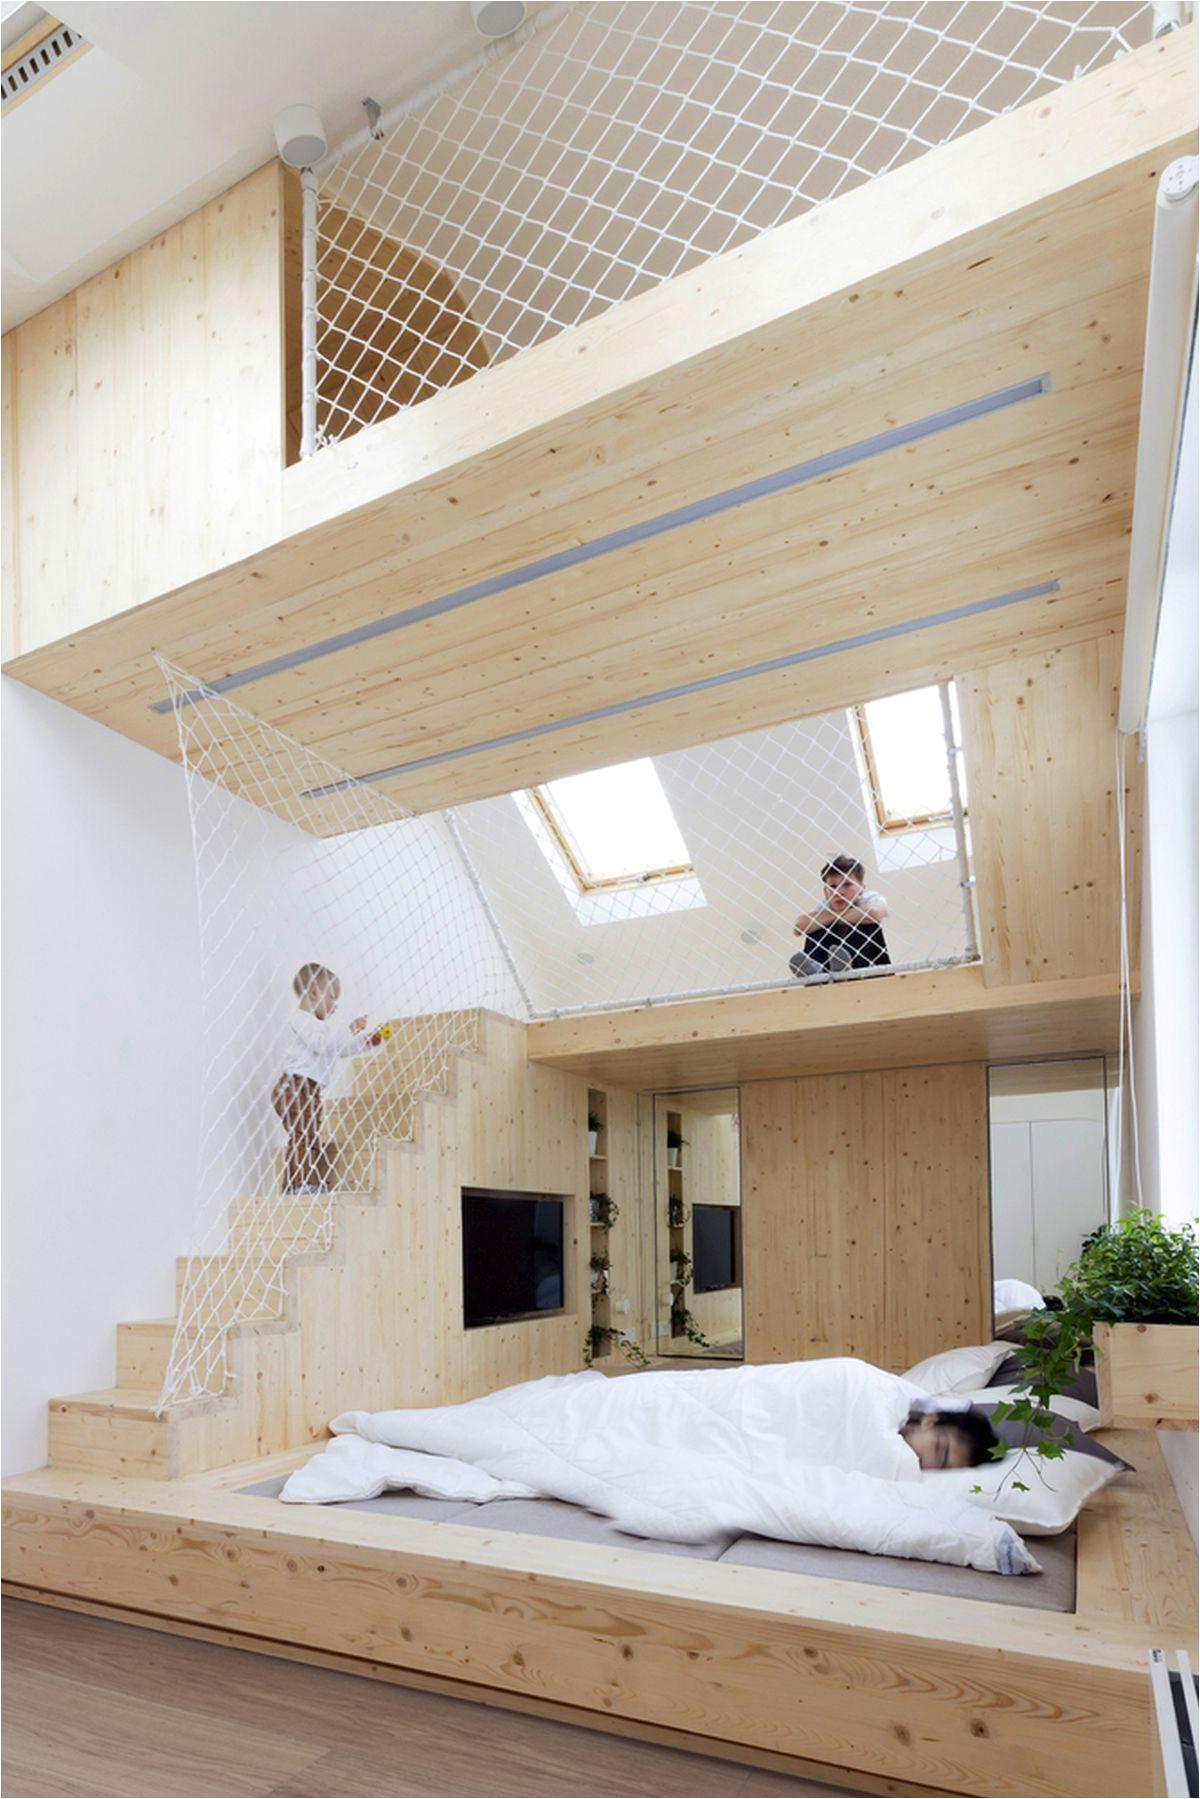 netten als trap balustrade scheidingswand of complete wand altillo casas prefabricadas baratas muebles